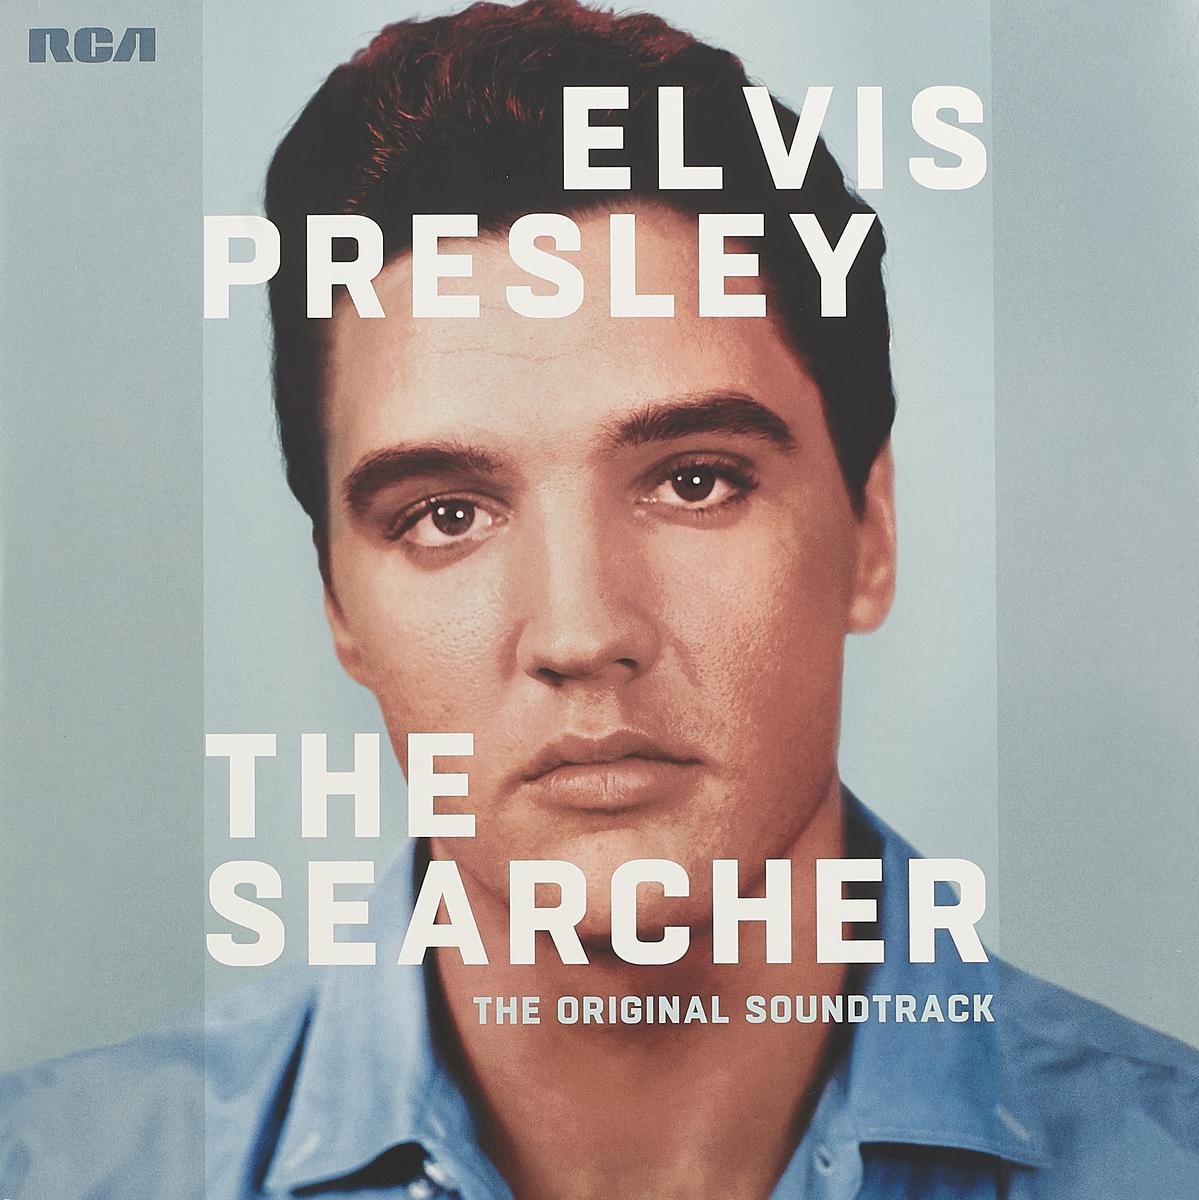 Элвис Пресли Elvis Presley. The Searcher (2 LP) lp cd elvis presley